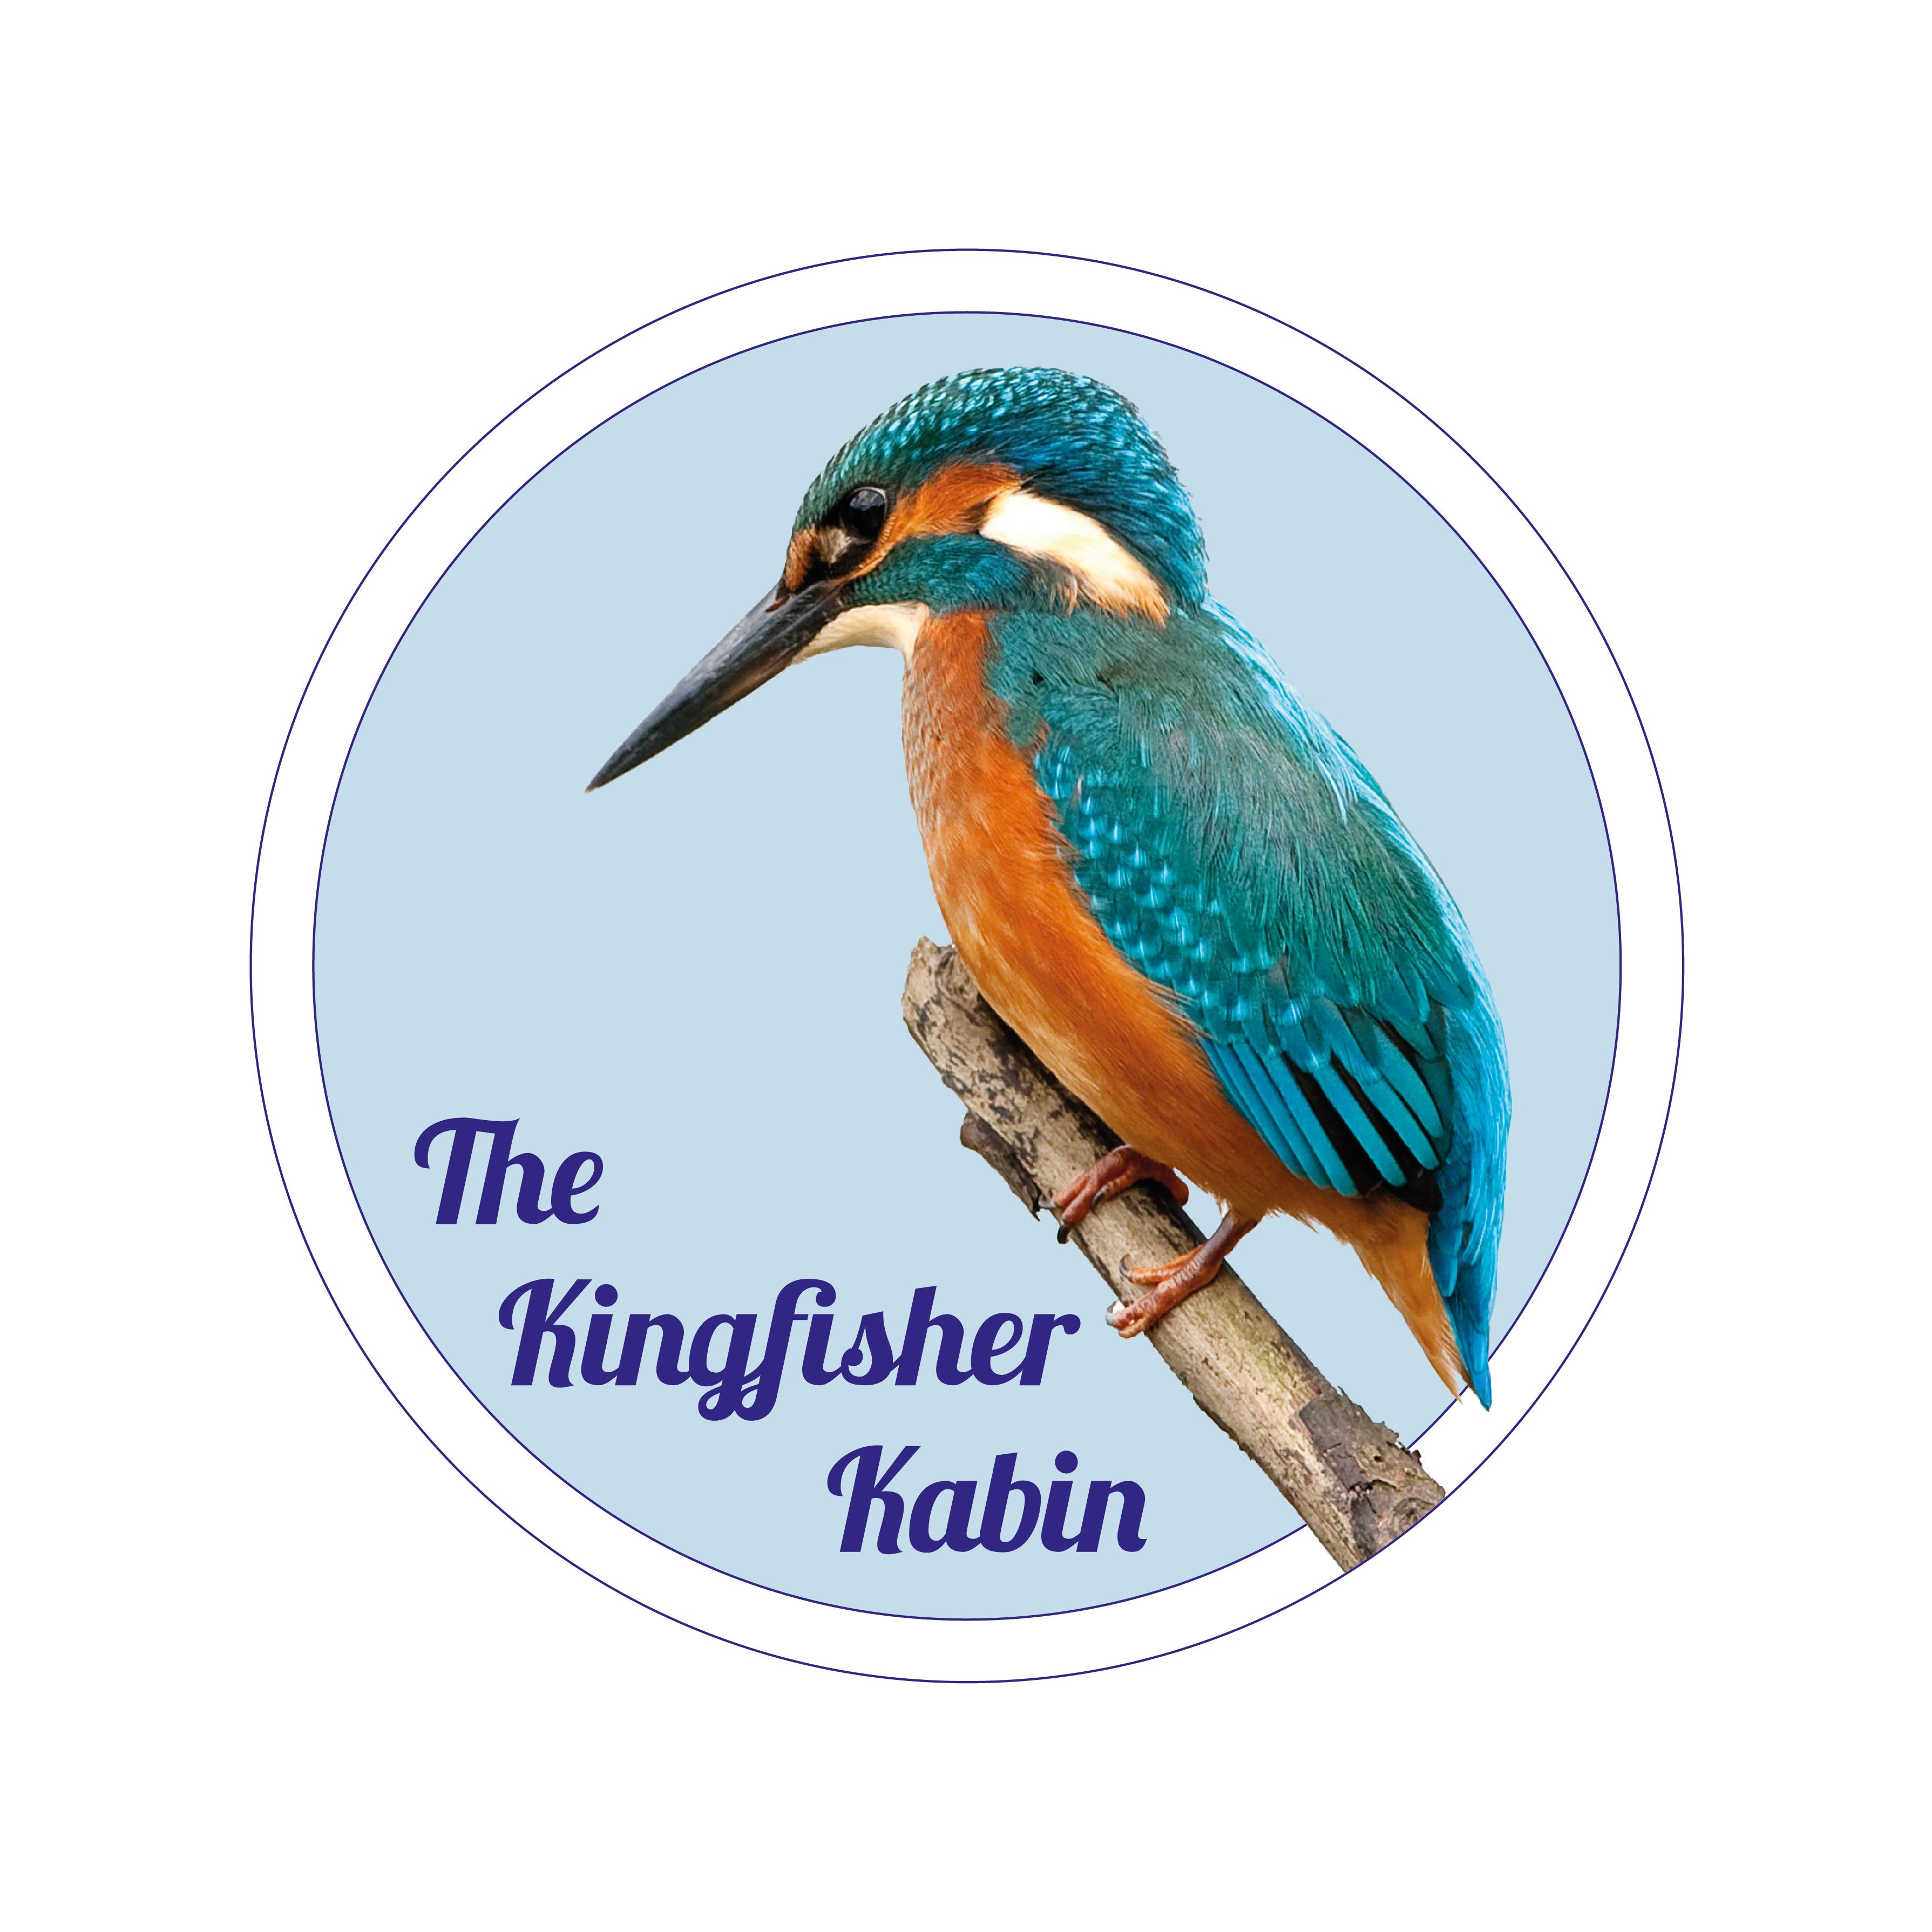 The Kingfisher Kabin